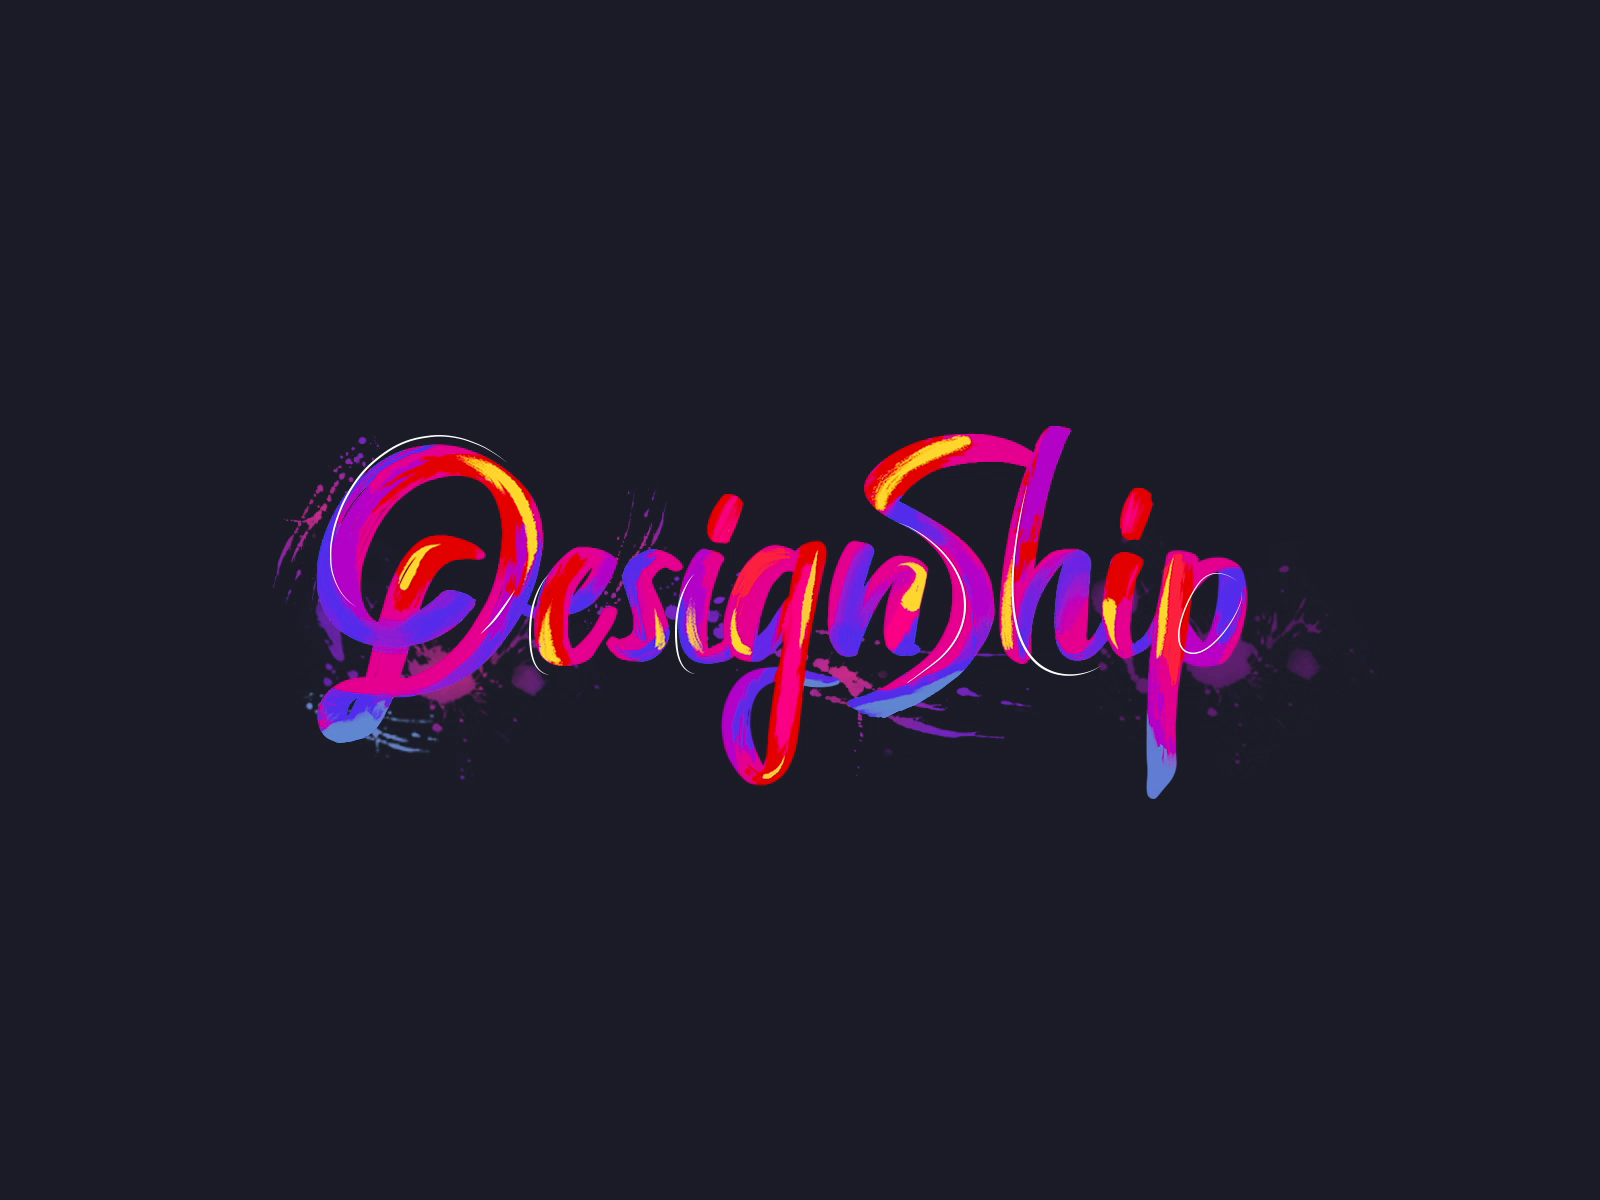 Designship